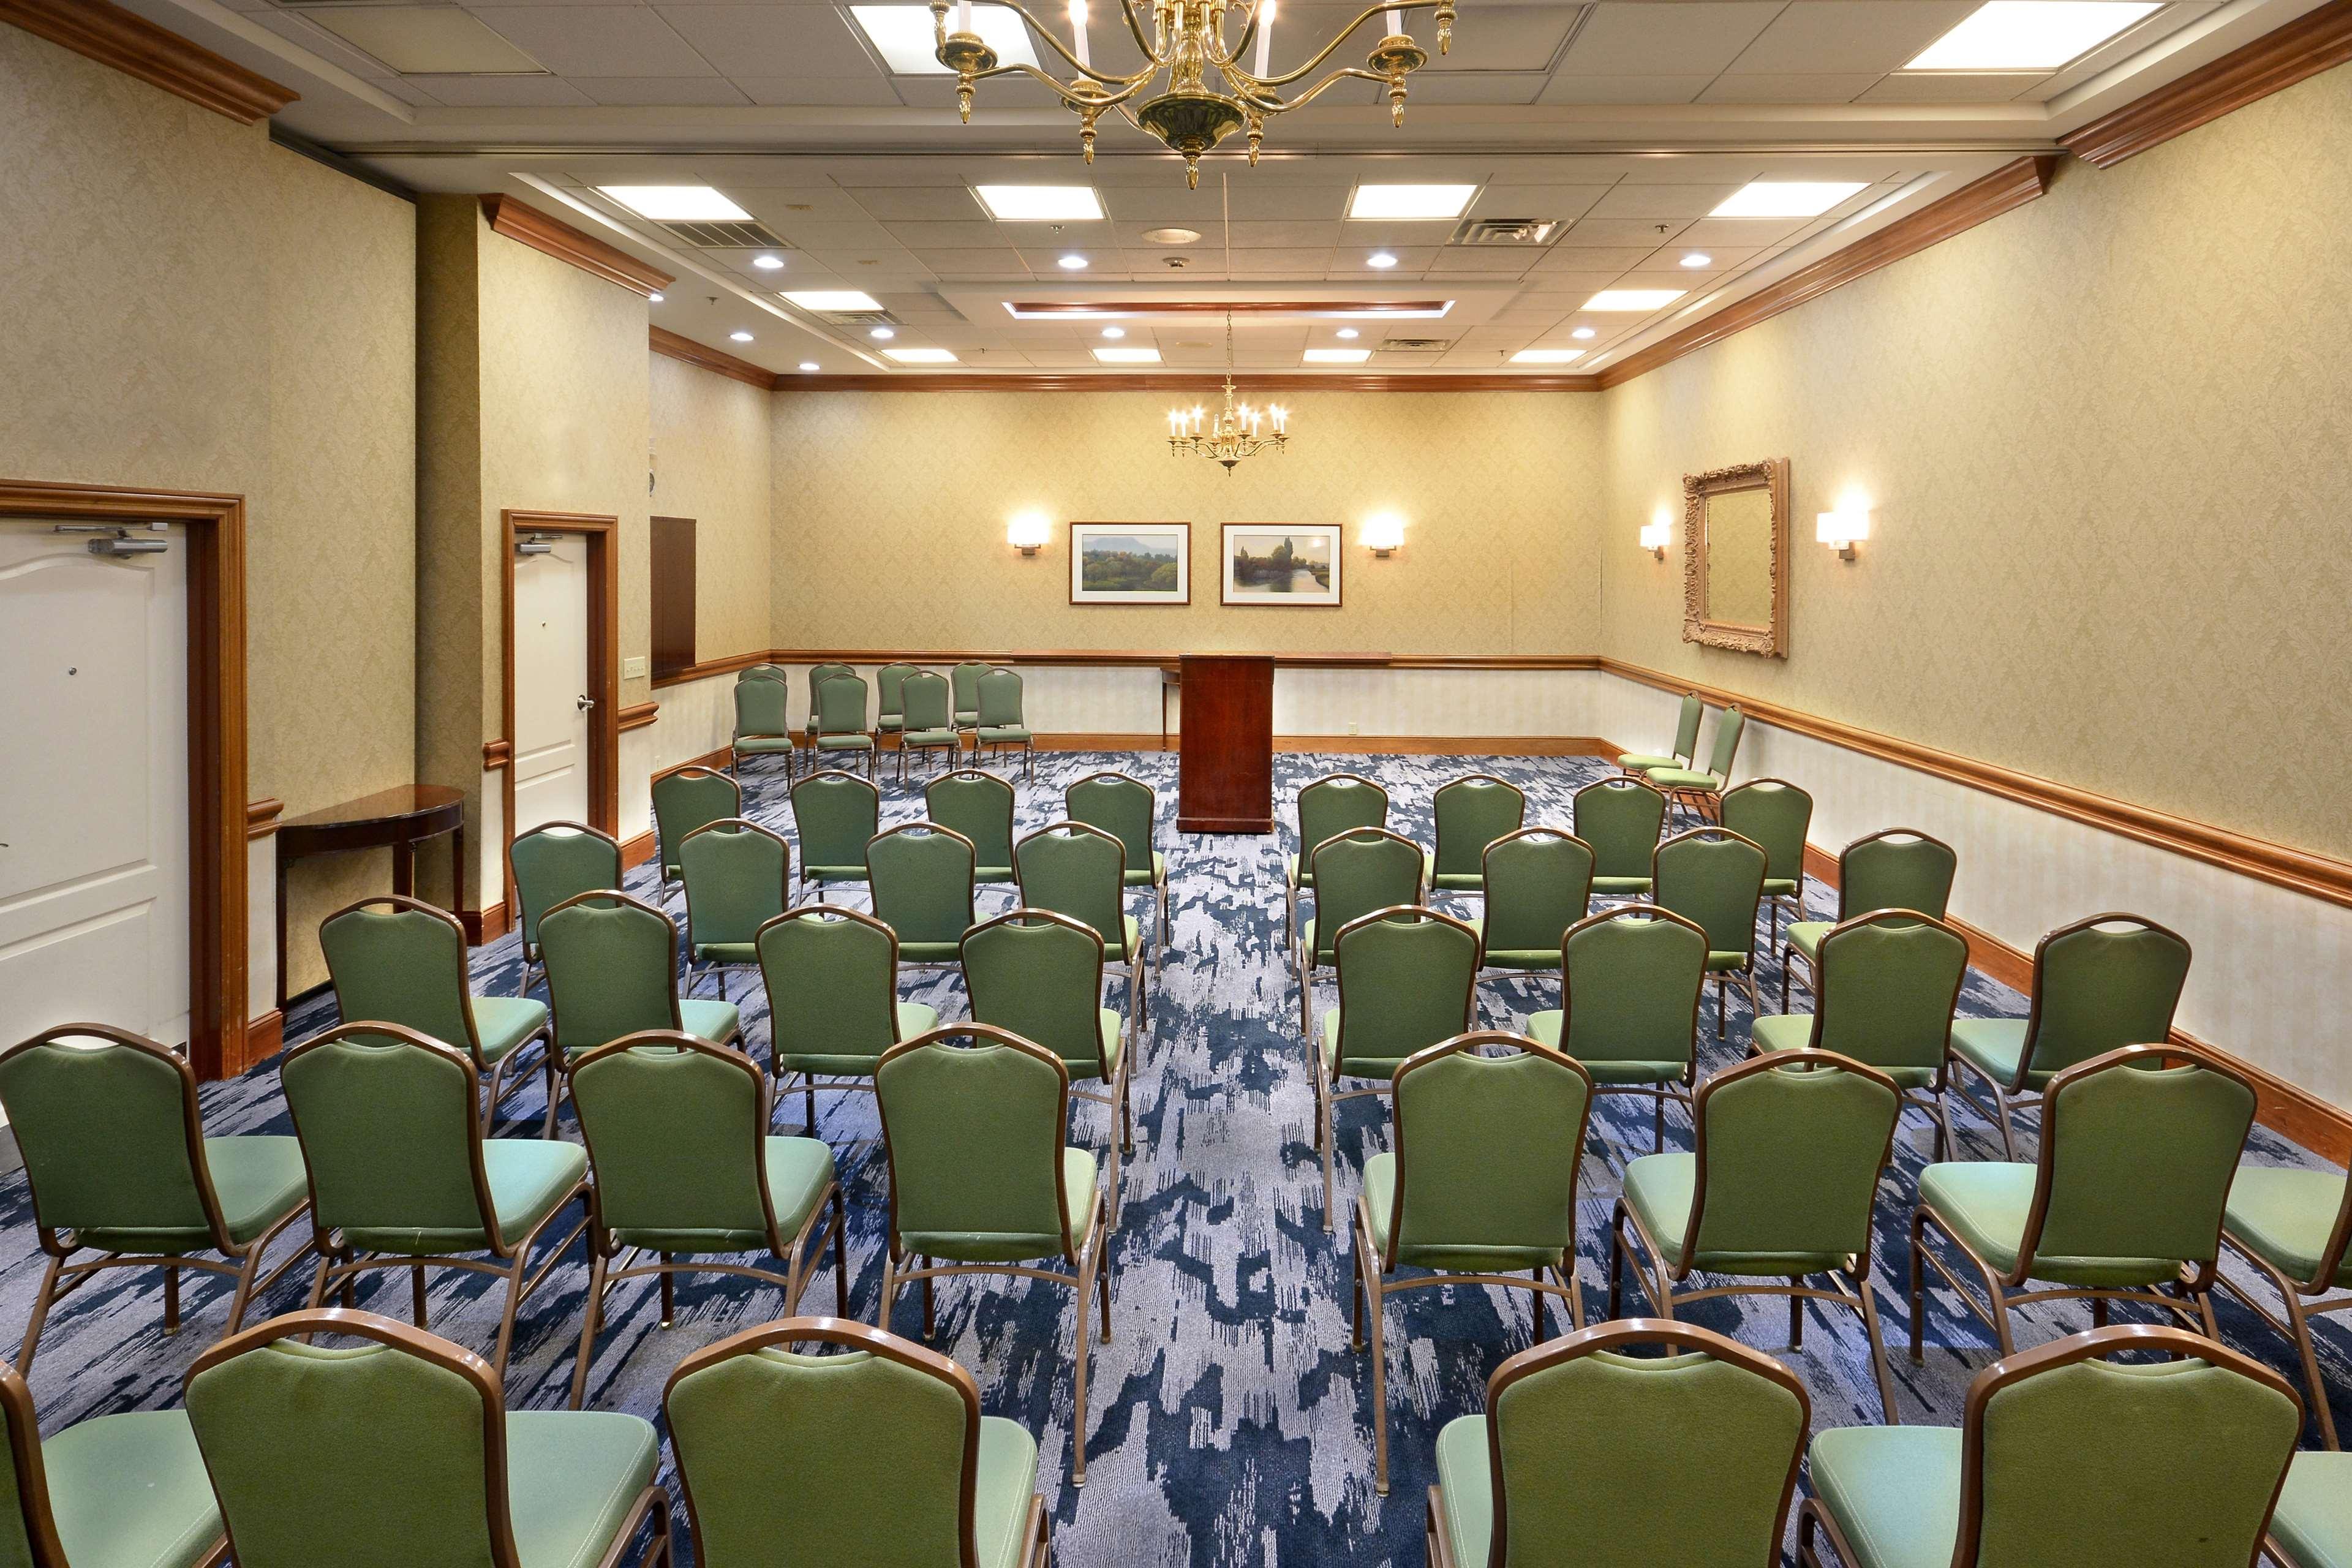 Hampton Inn & Suites Greenville/Spartanburg I-85 image 49